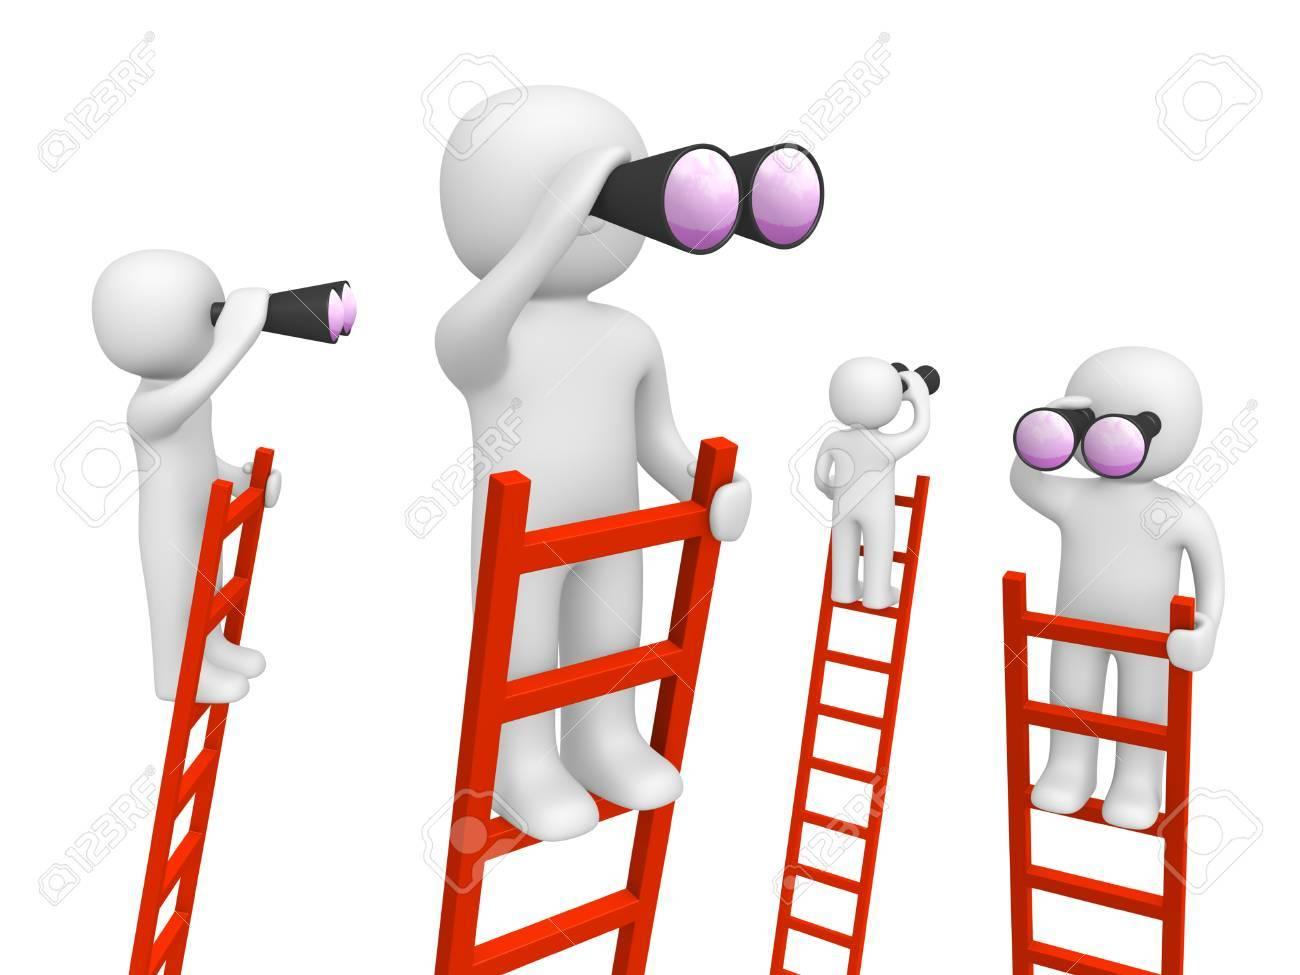 3d people standing on the ladders and looking through binoculars. 3d render. - 88363467